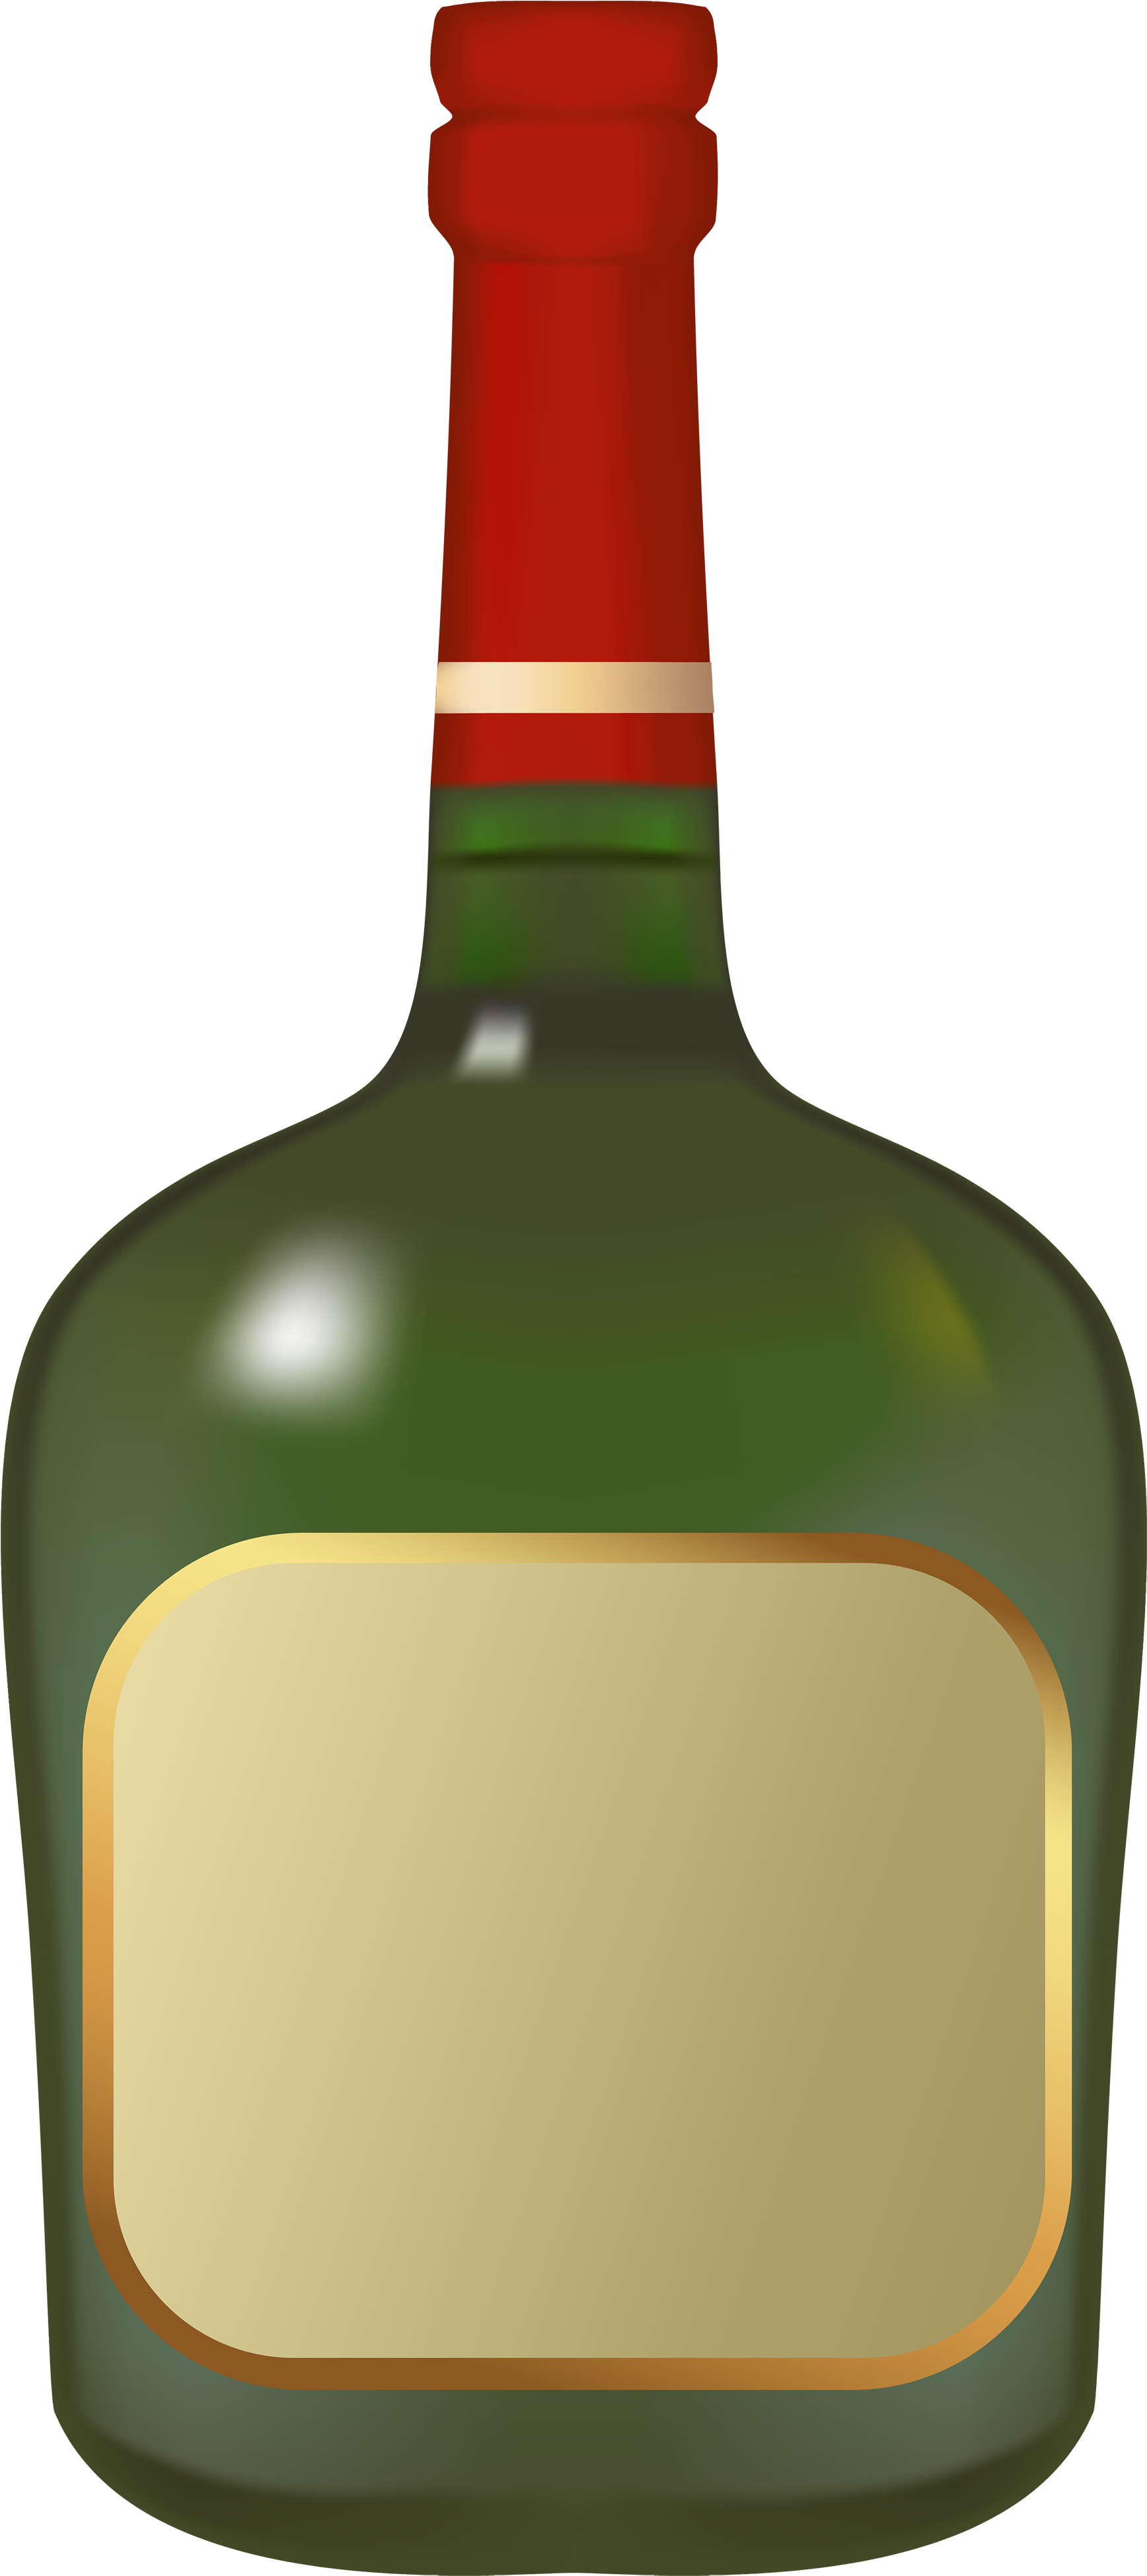 1736x3900 Hd Liquor Bottle Png Clipart